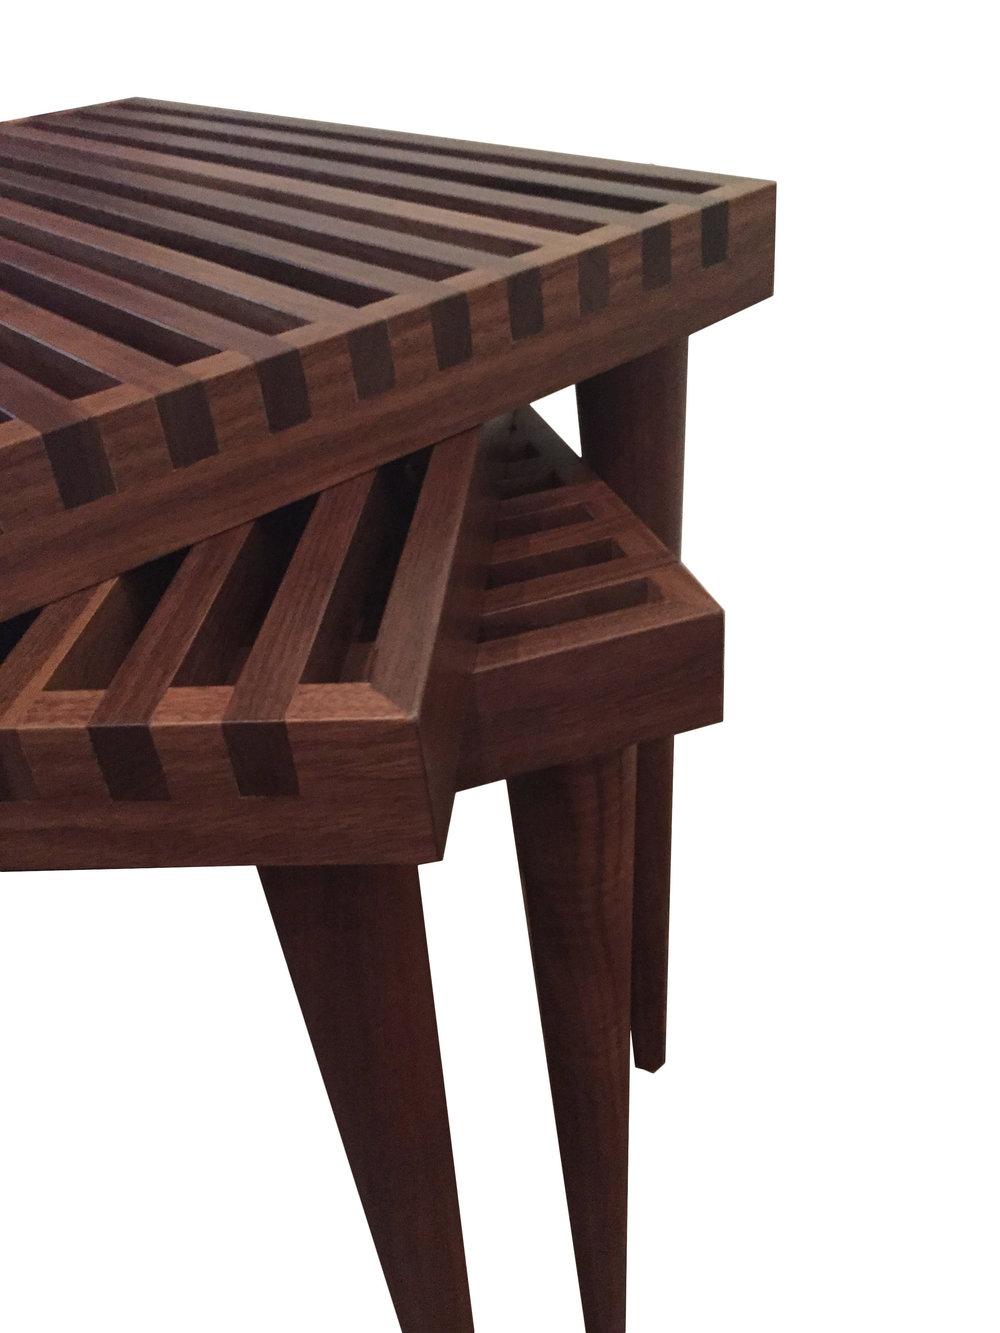 smilow-furniture-slatted-stacking-table-3-1.jpg